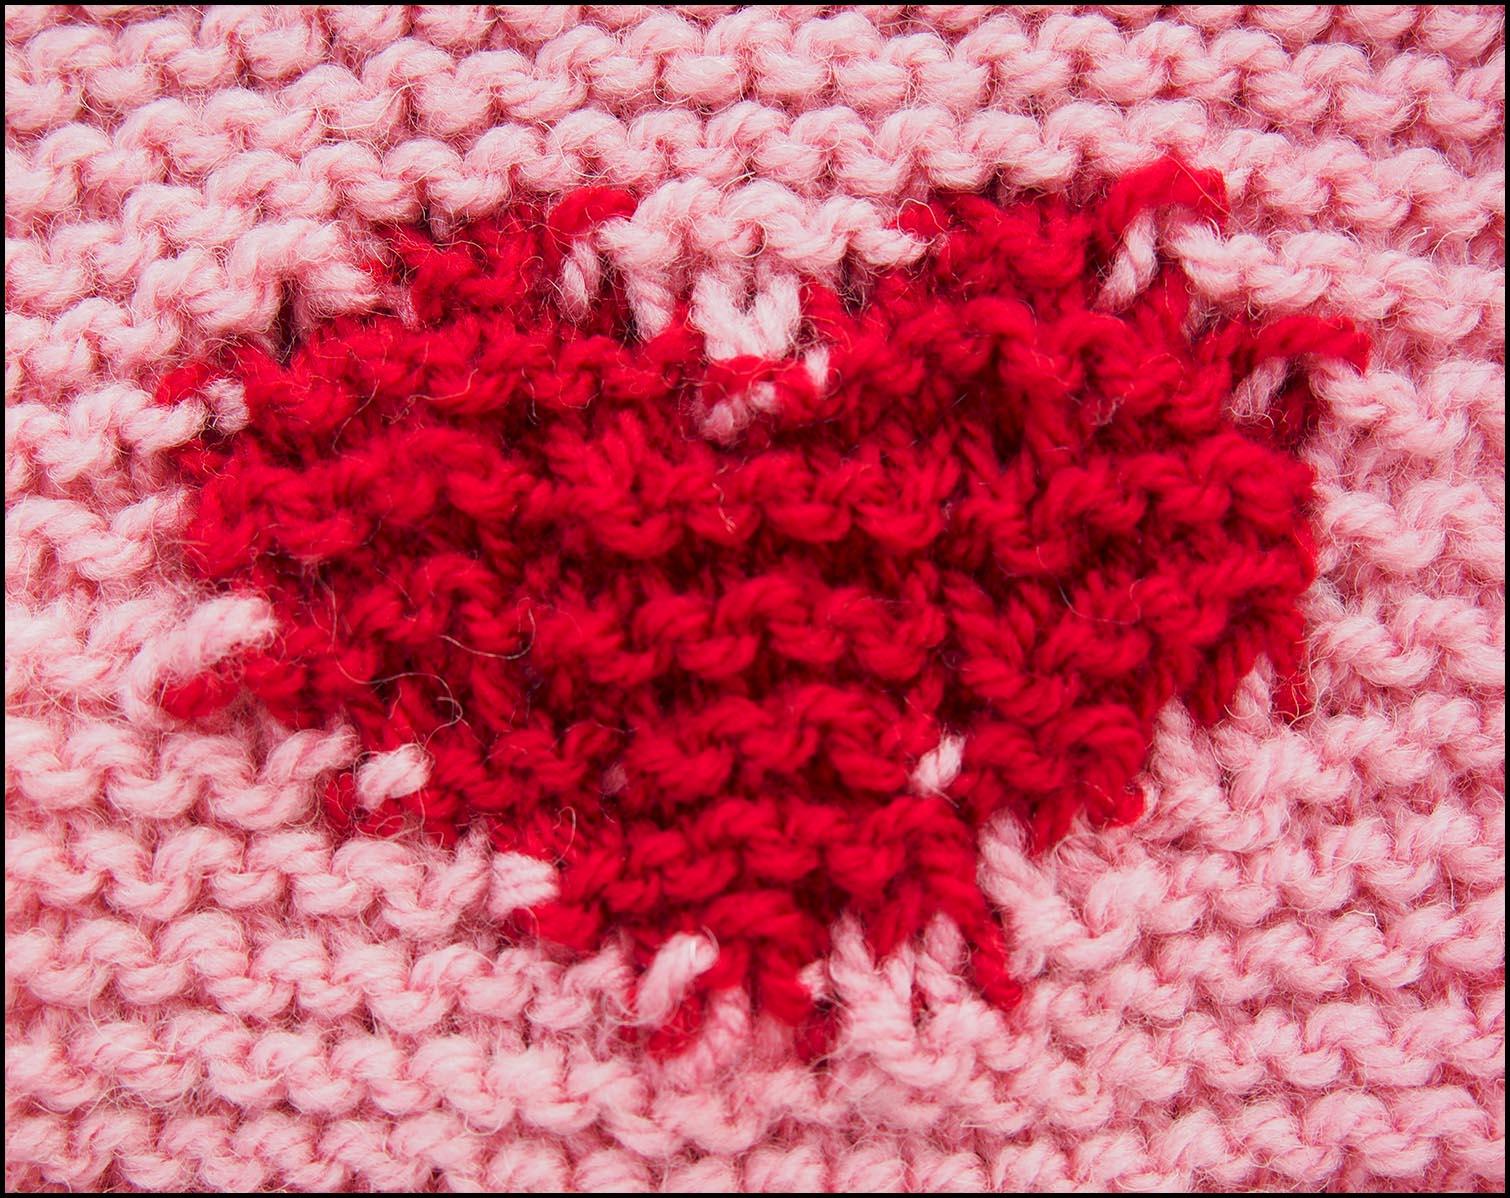 Knitted-Intarsia-Heart.jpg